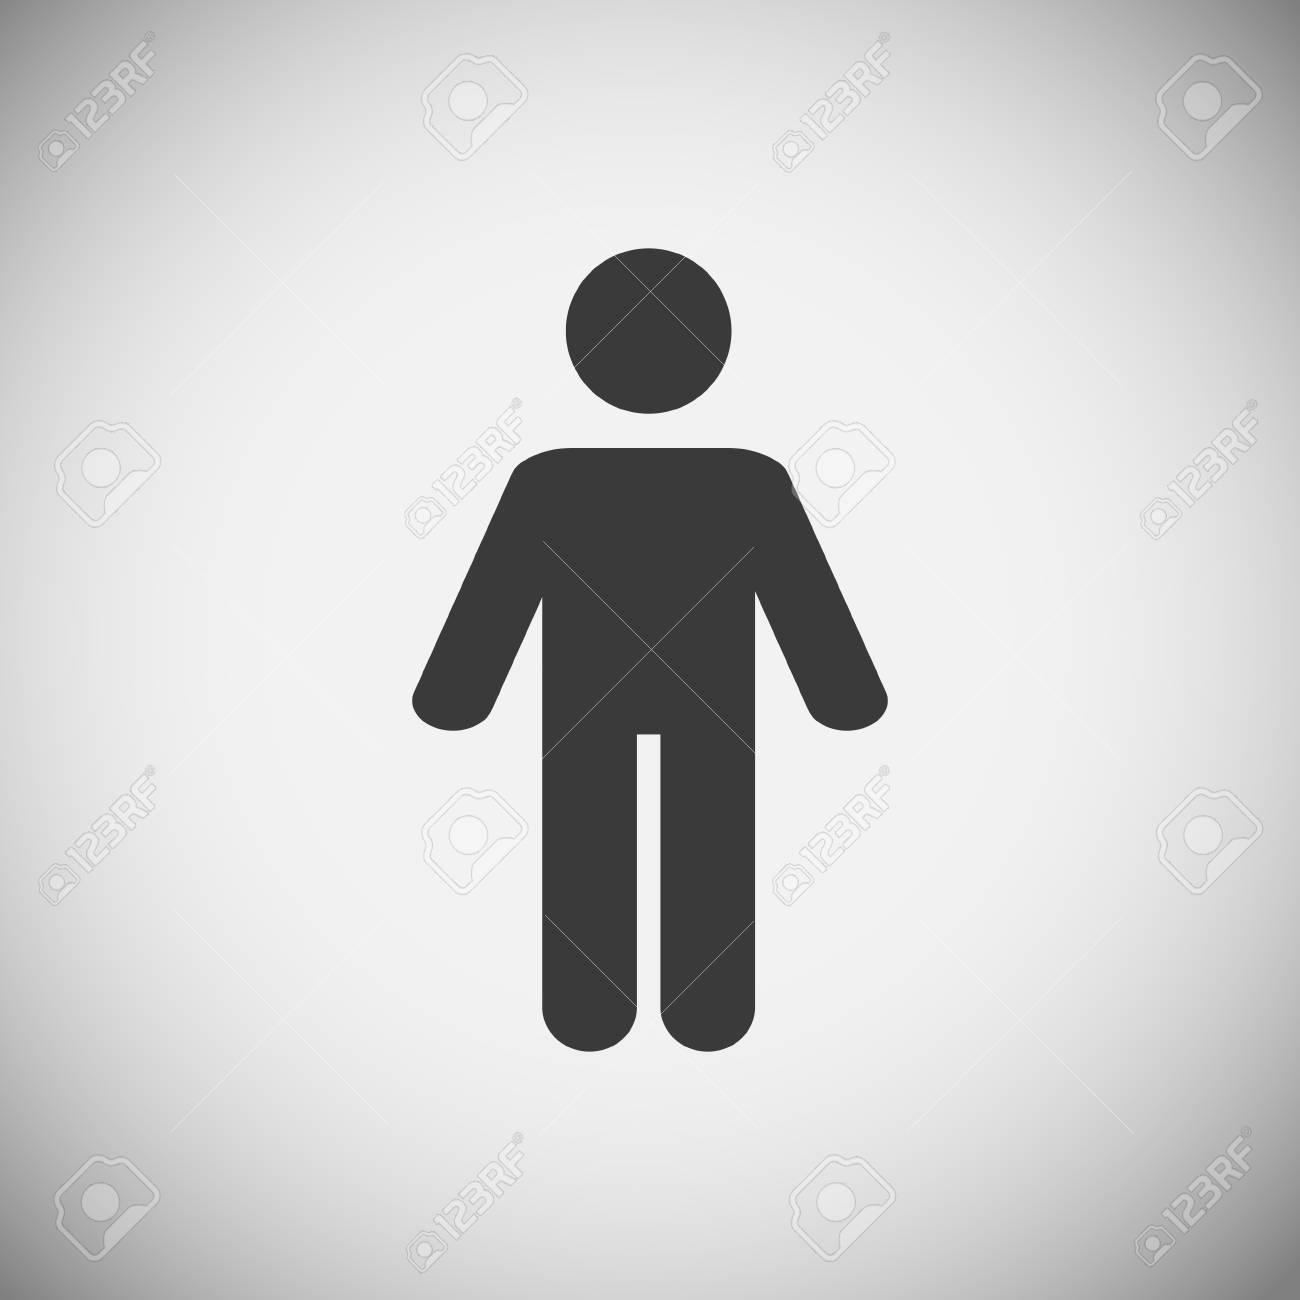 Man application icons vector illustration Stock Vector - 22258949